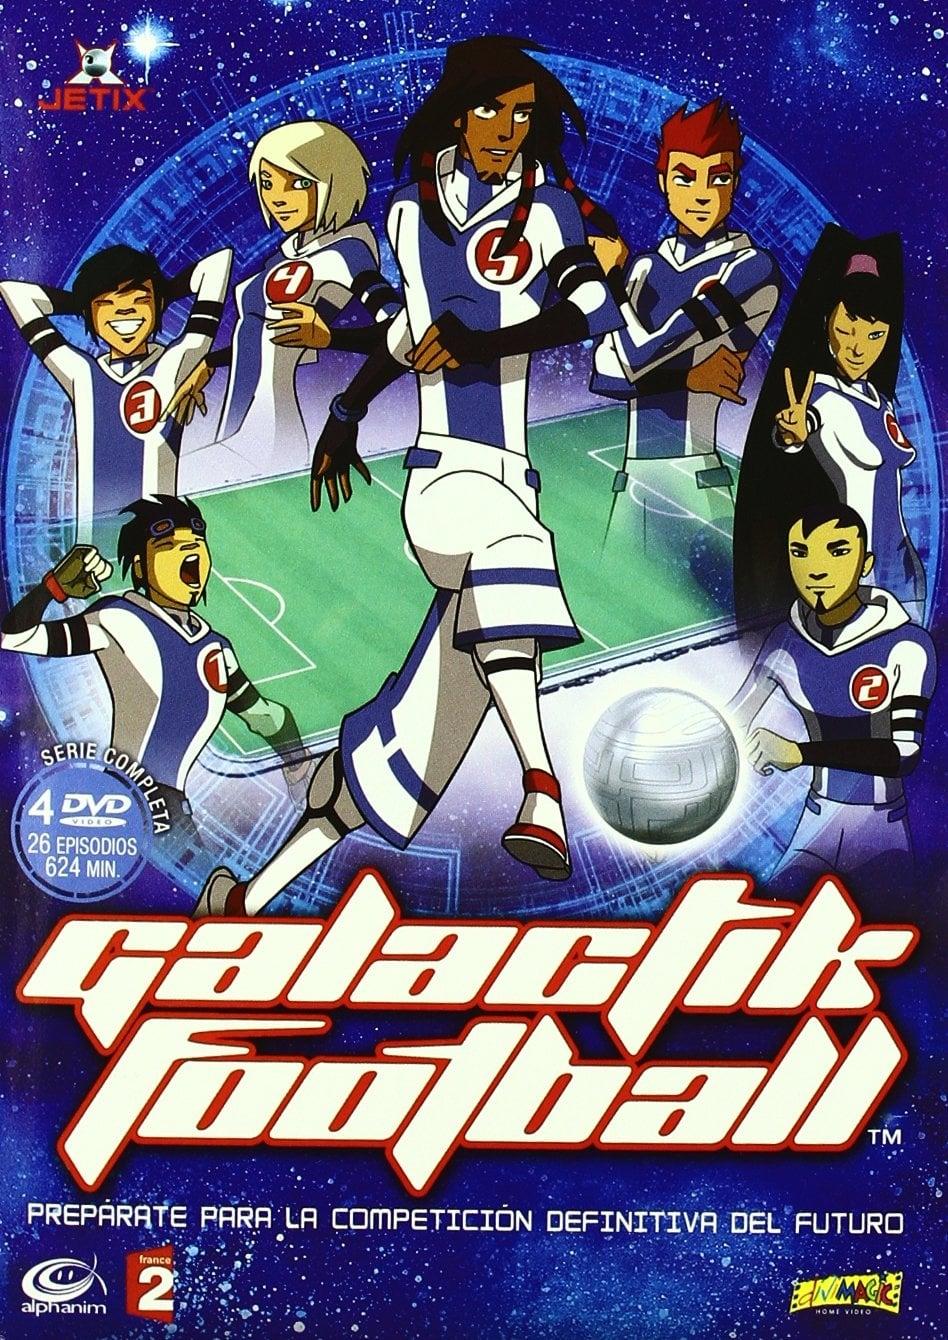 Galactic Football